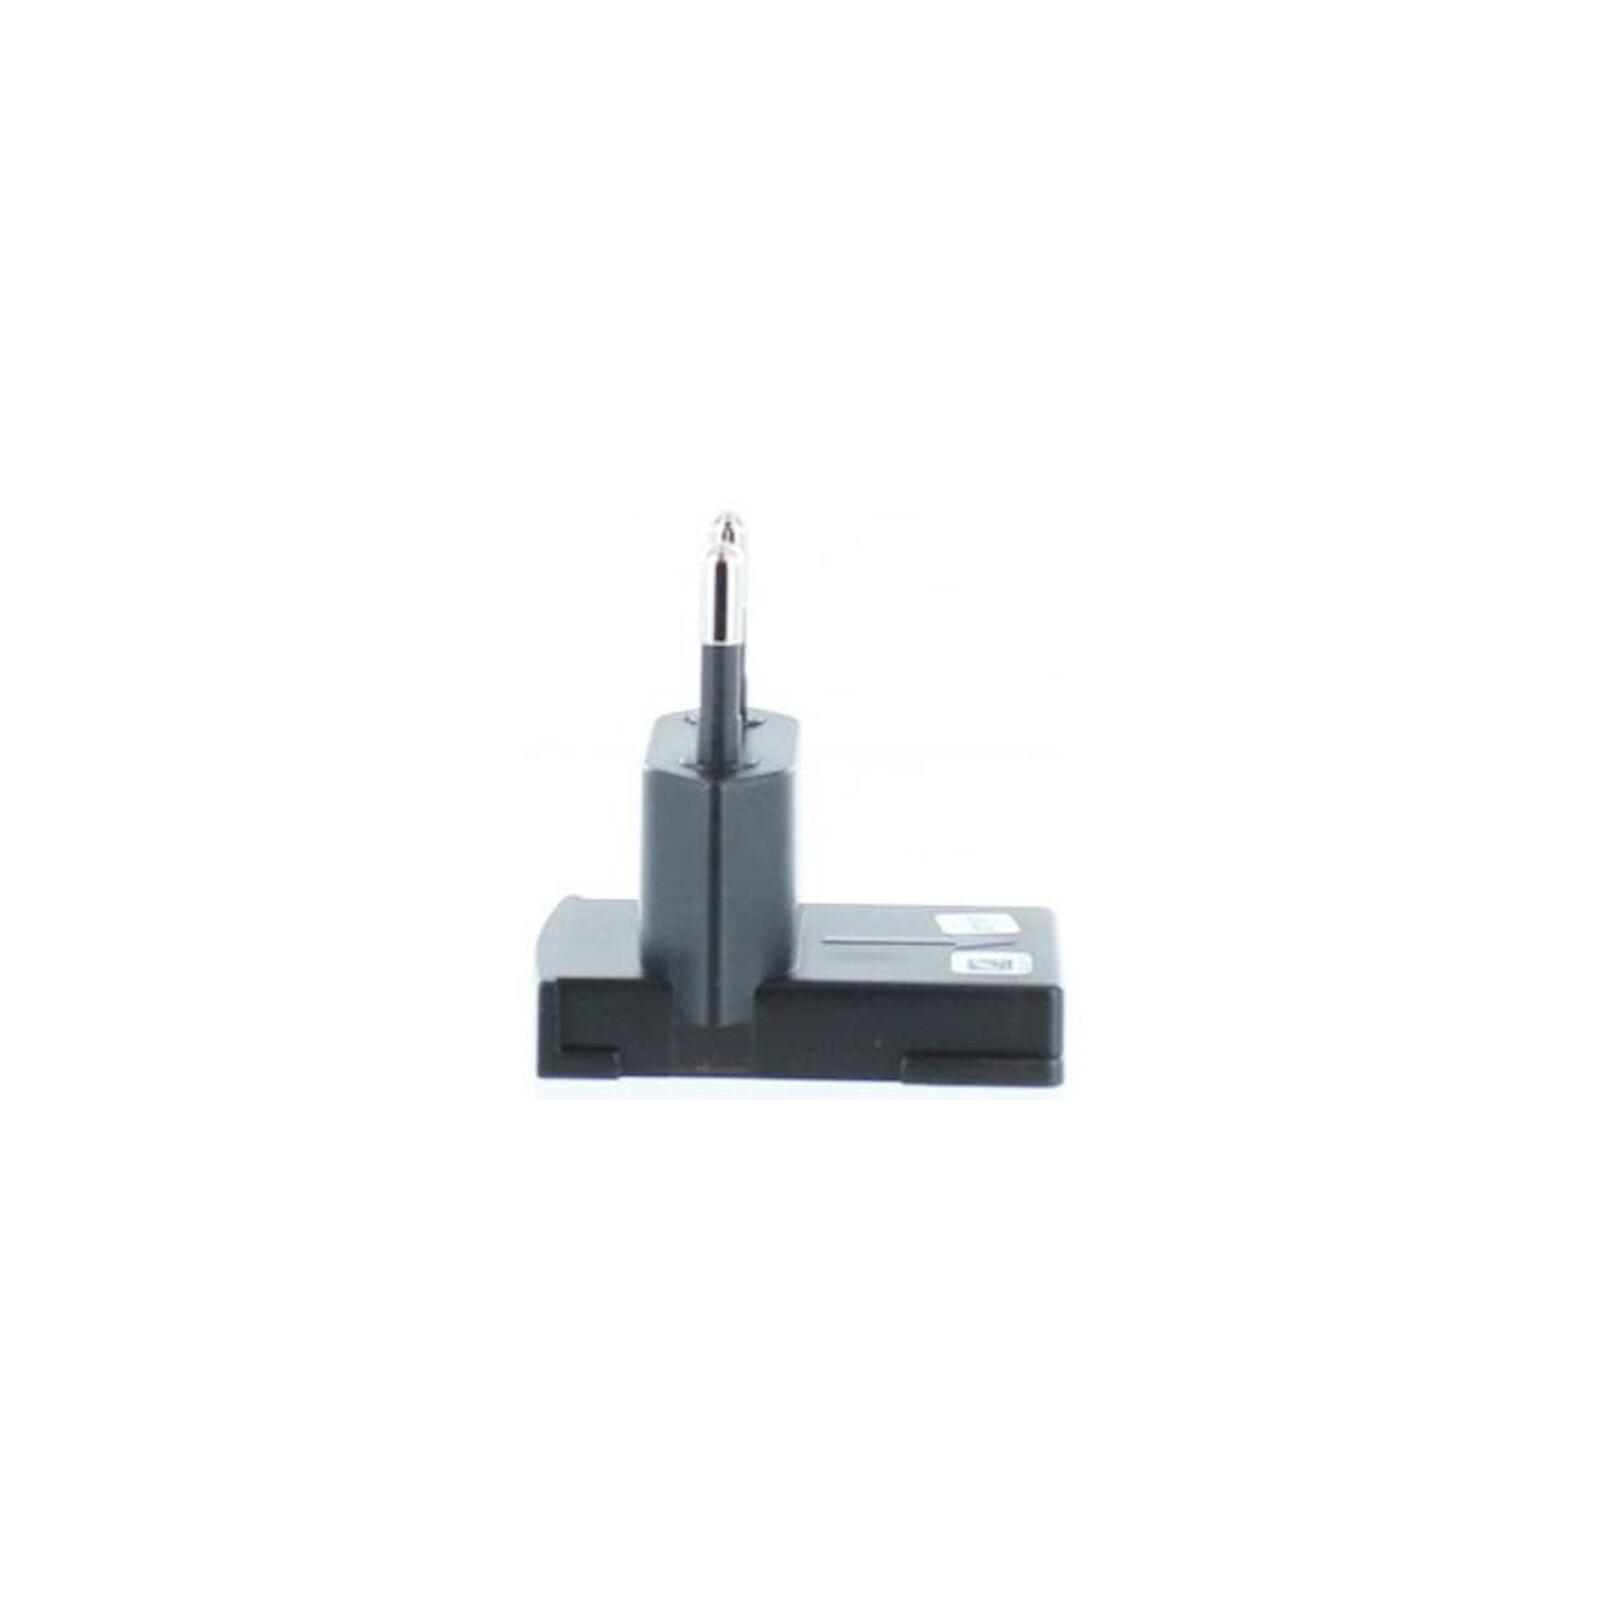 Lenovo EU-Stecker Ideapad MIIX 310-10lCR